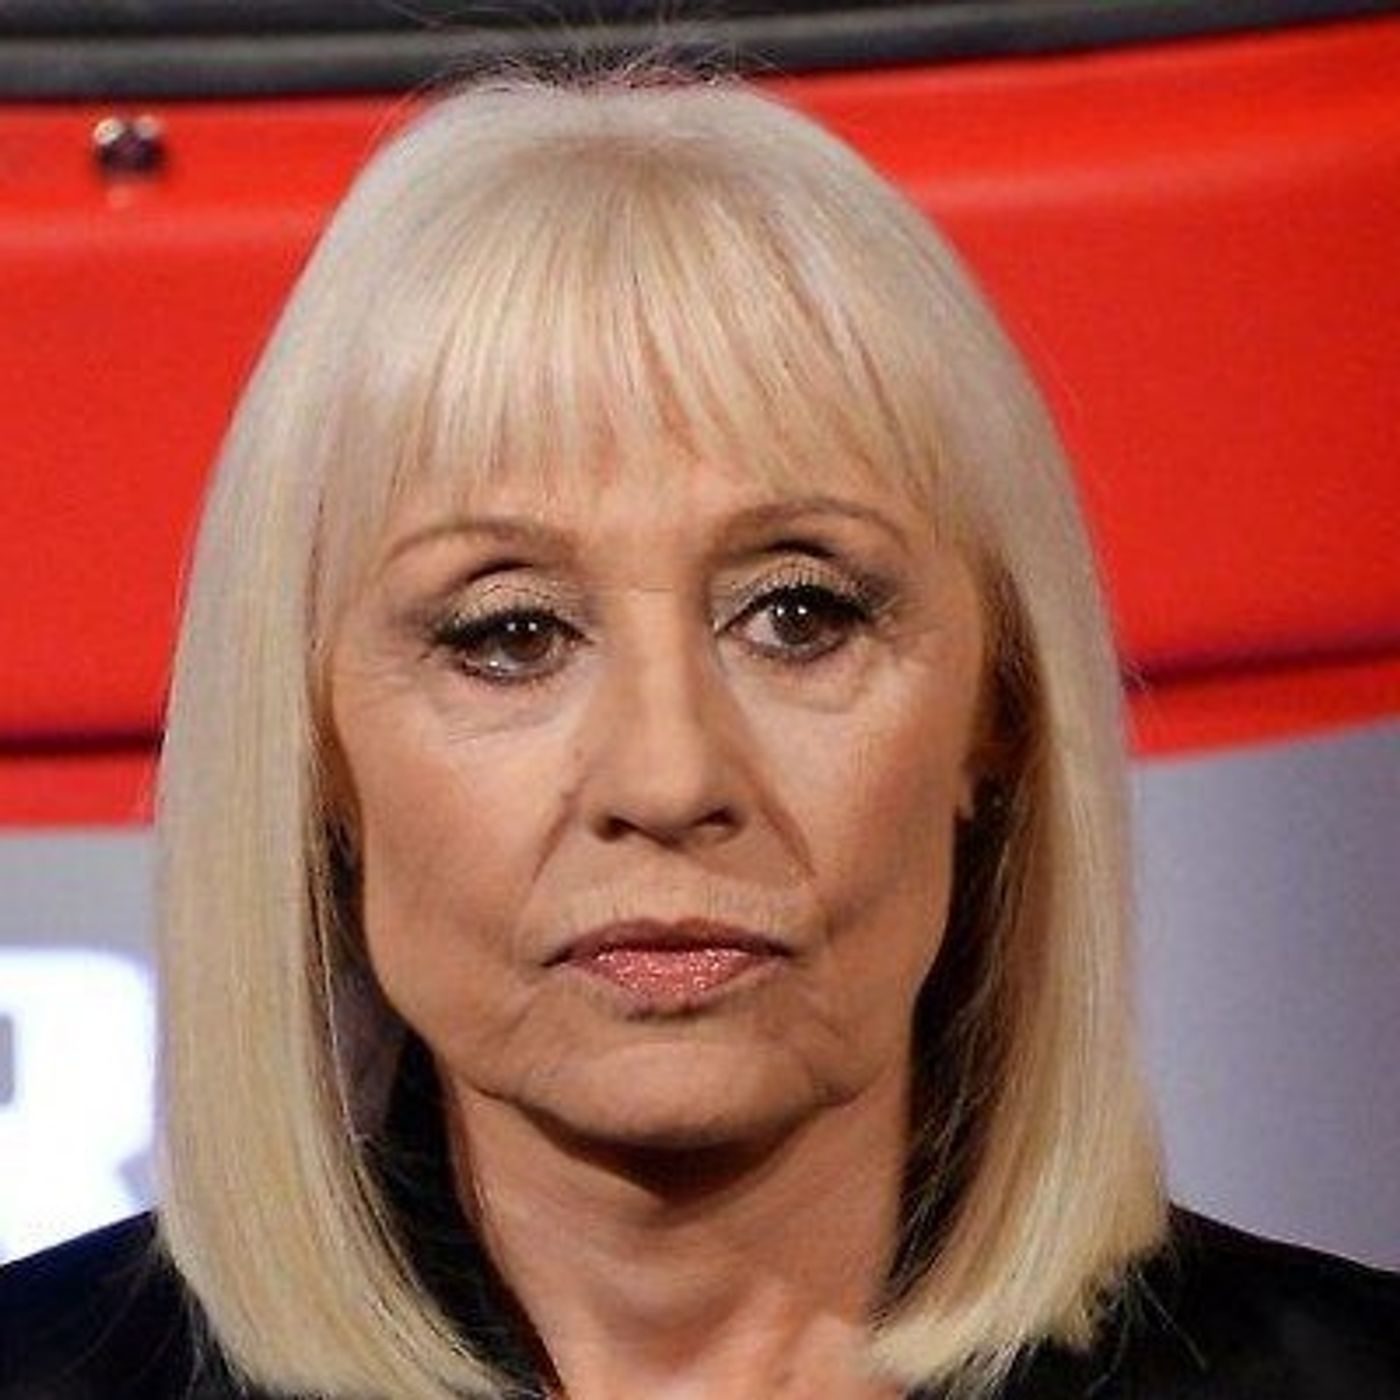 Raffaella Carrà, dal tuca tuca al gay pride